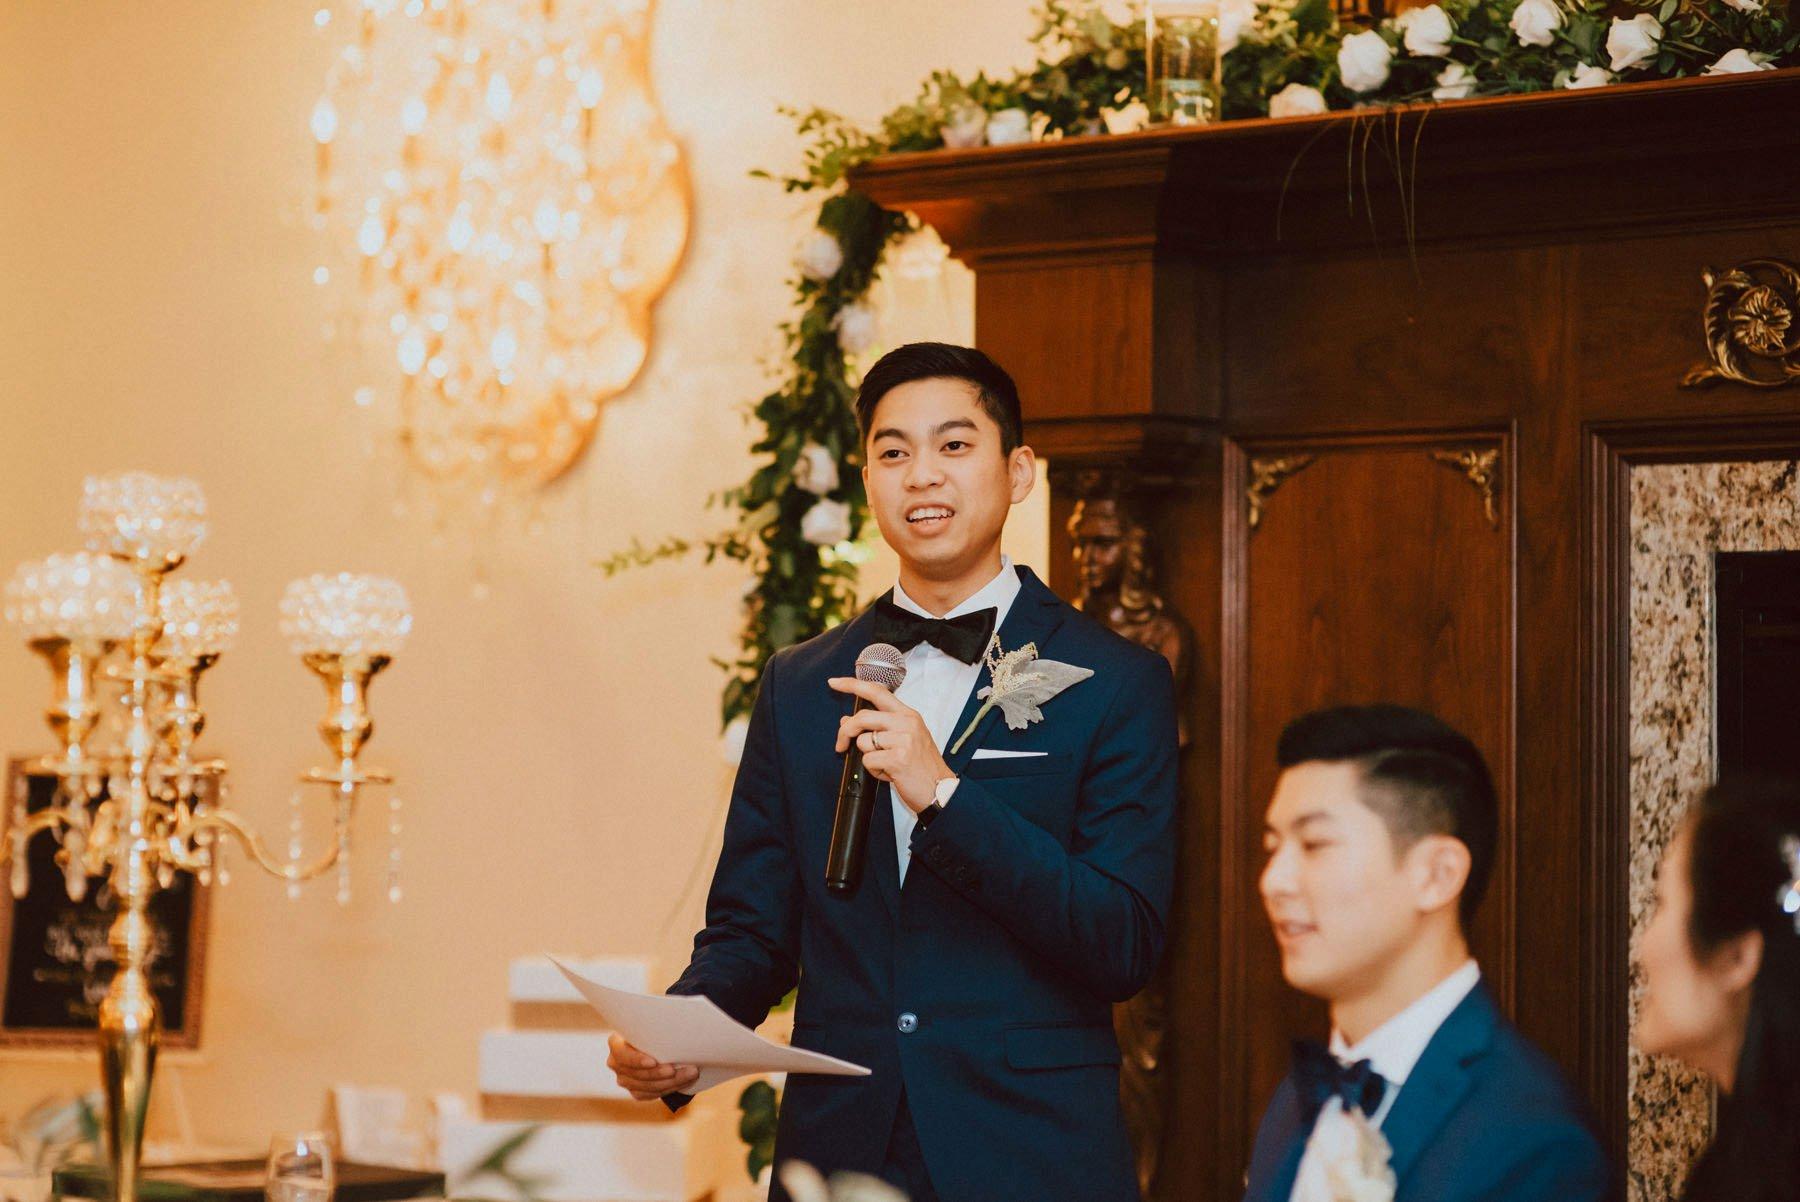 philadelphia-wedding-photographer-148.jpg